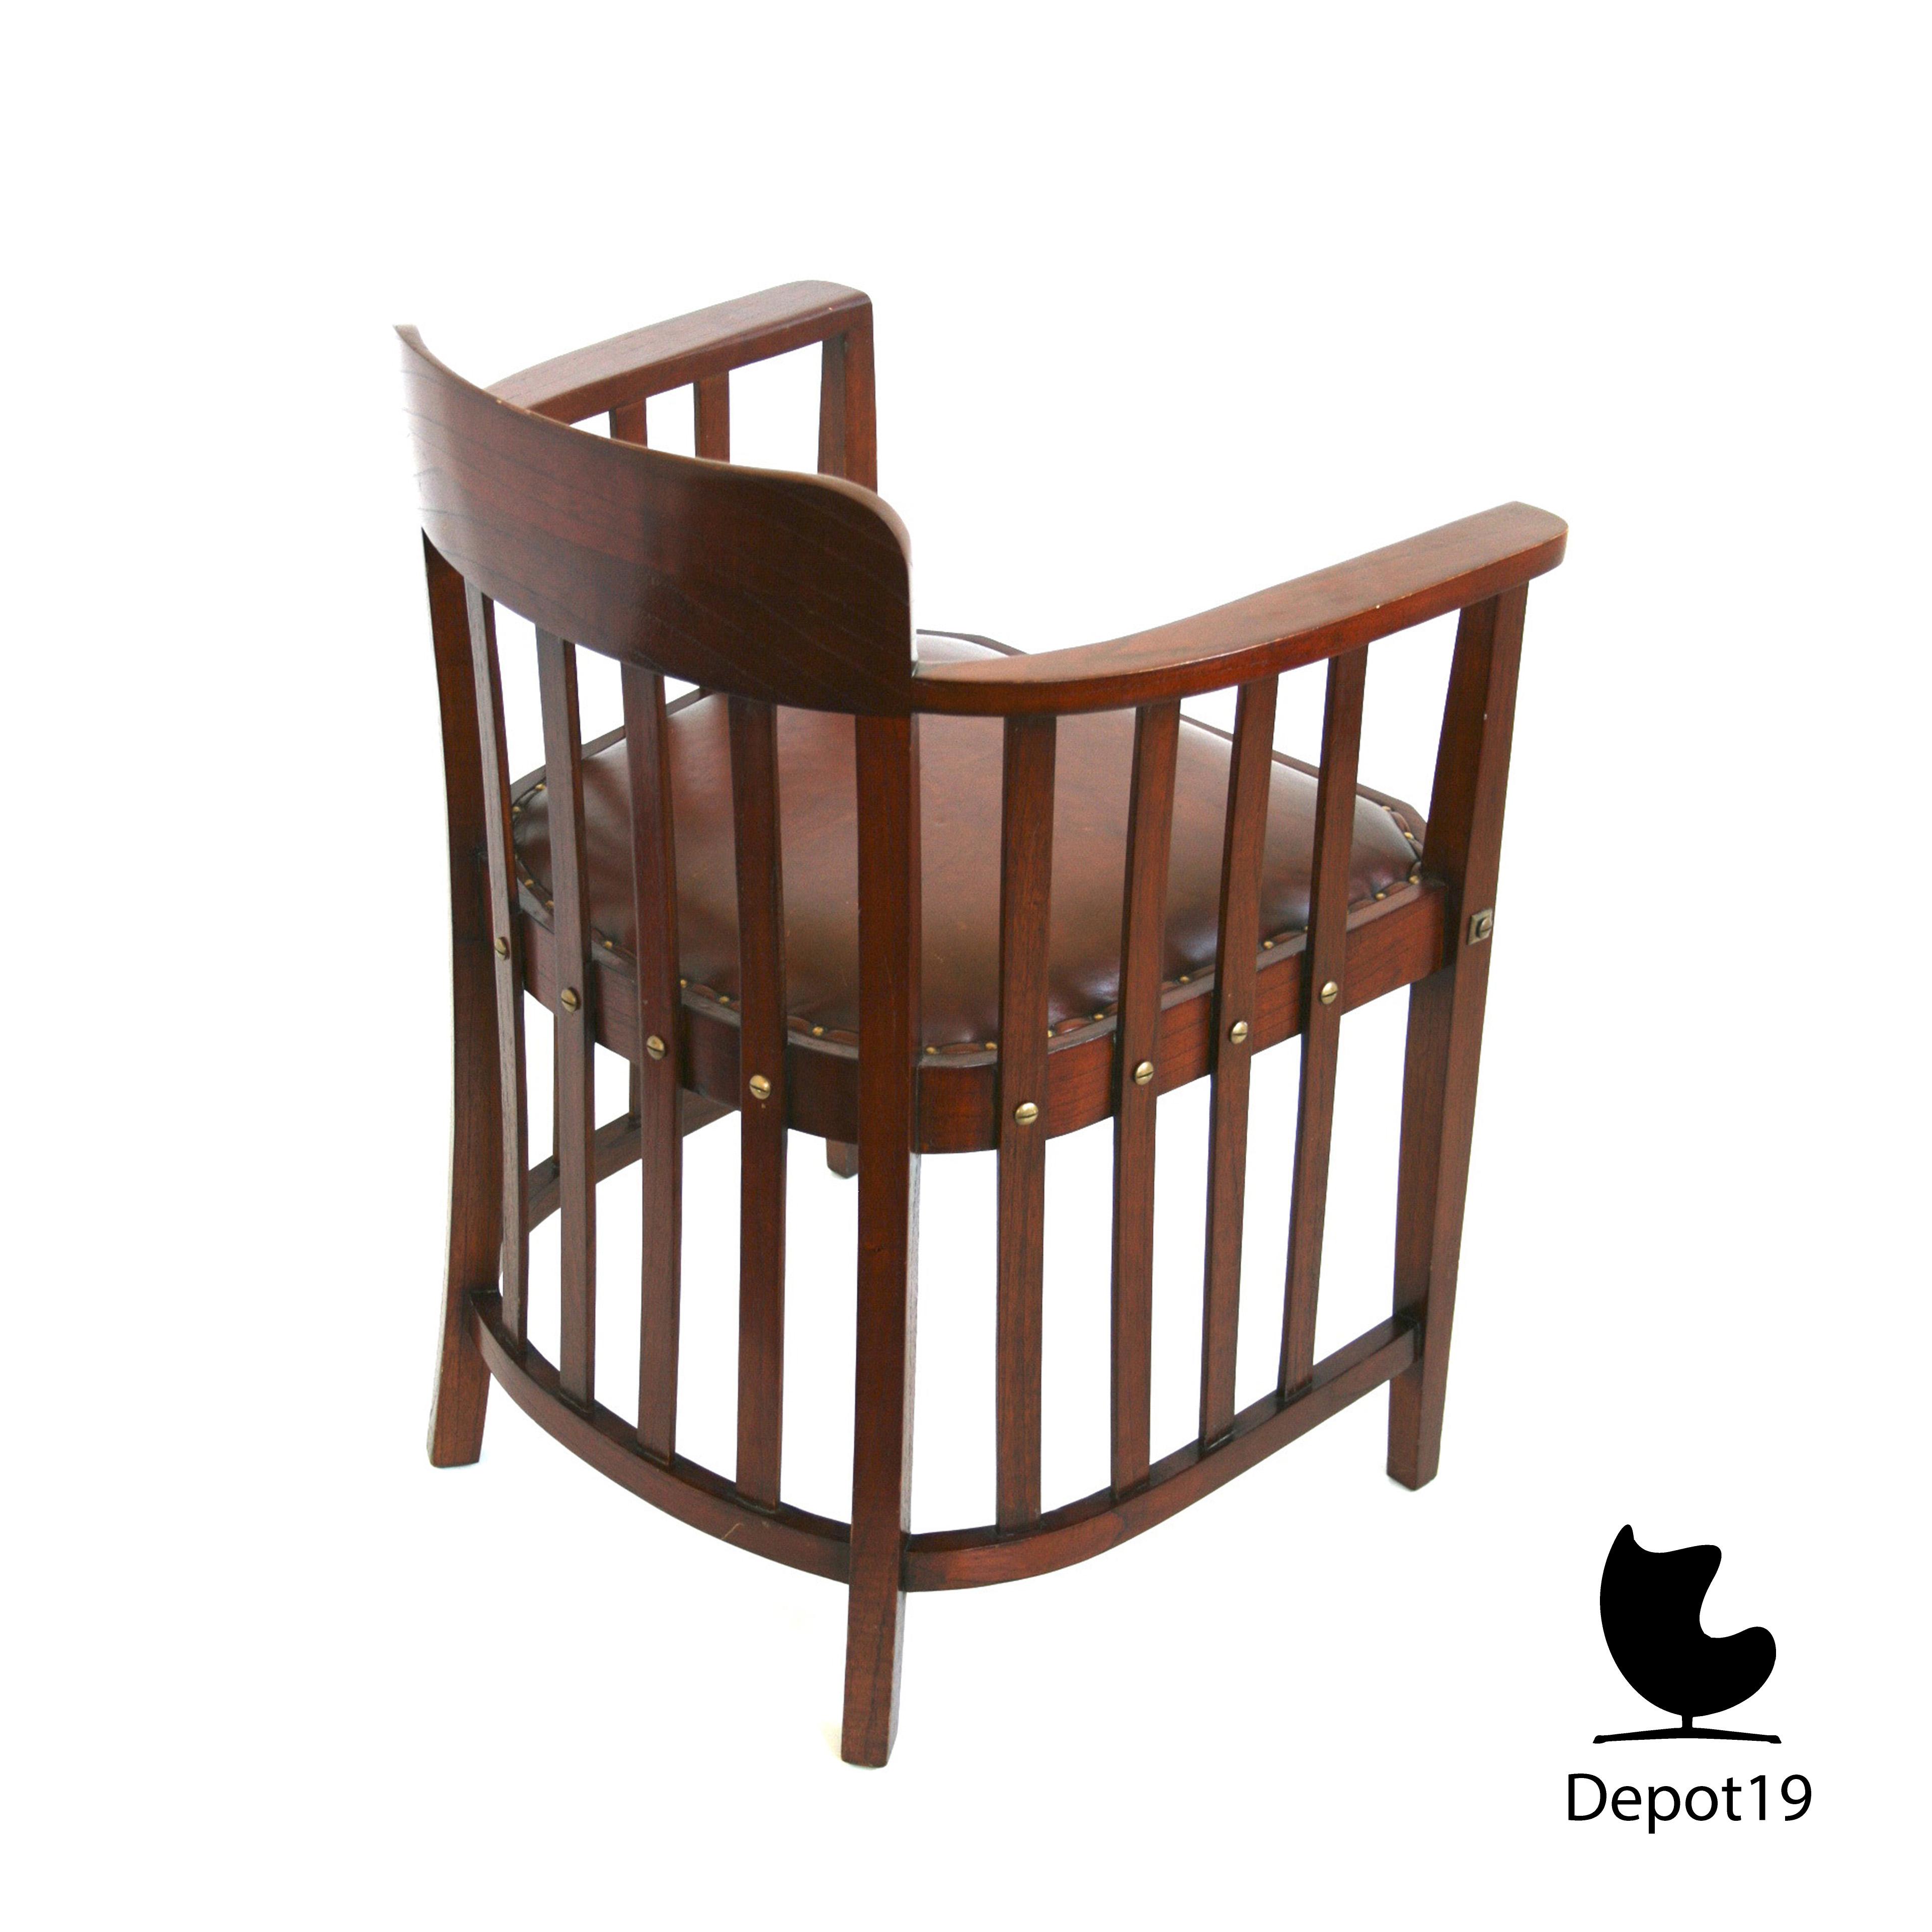 globe office chairs. Globe Wernicke Cedar Office Chair. Globe_Wernicke_cedar_office_chair_depot_19_6.jpg. Globe_Wernicke_cedar_office_chair_depot_19_1.jpg Chairs